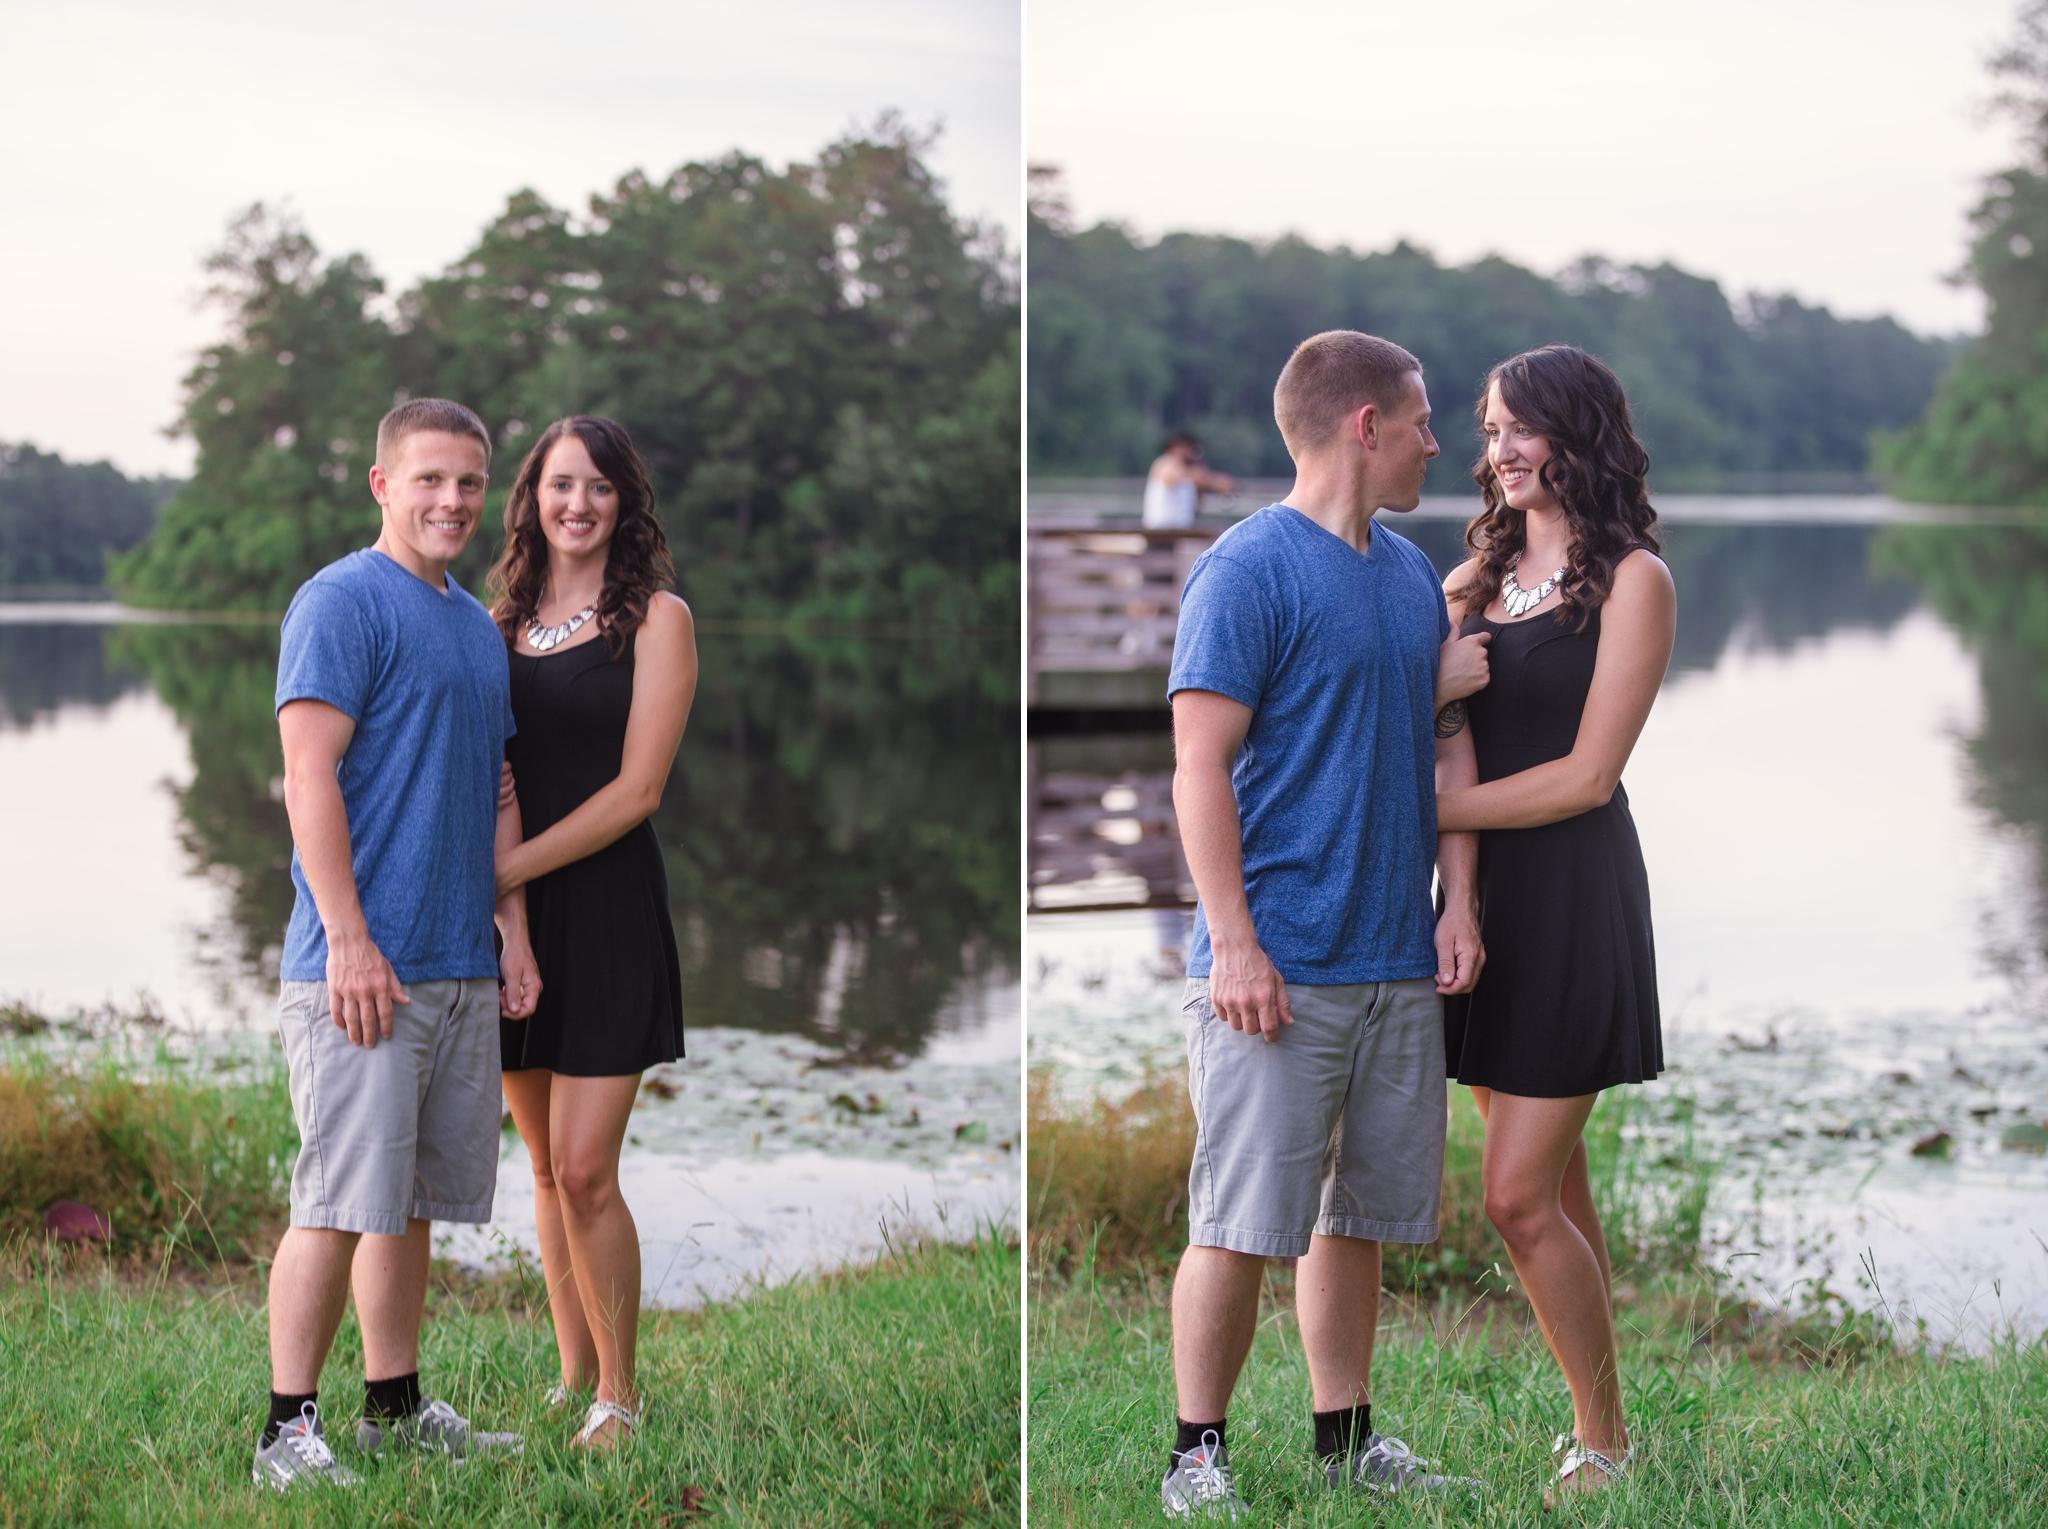 Anniversary Photography at Lake Rim, Fayetteville North Carolina